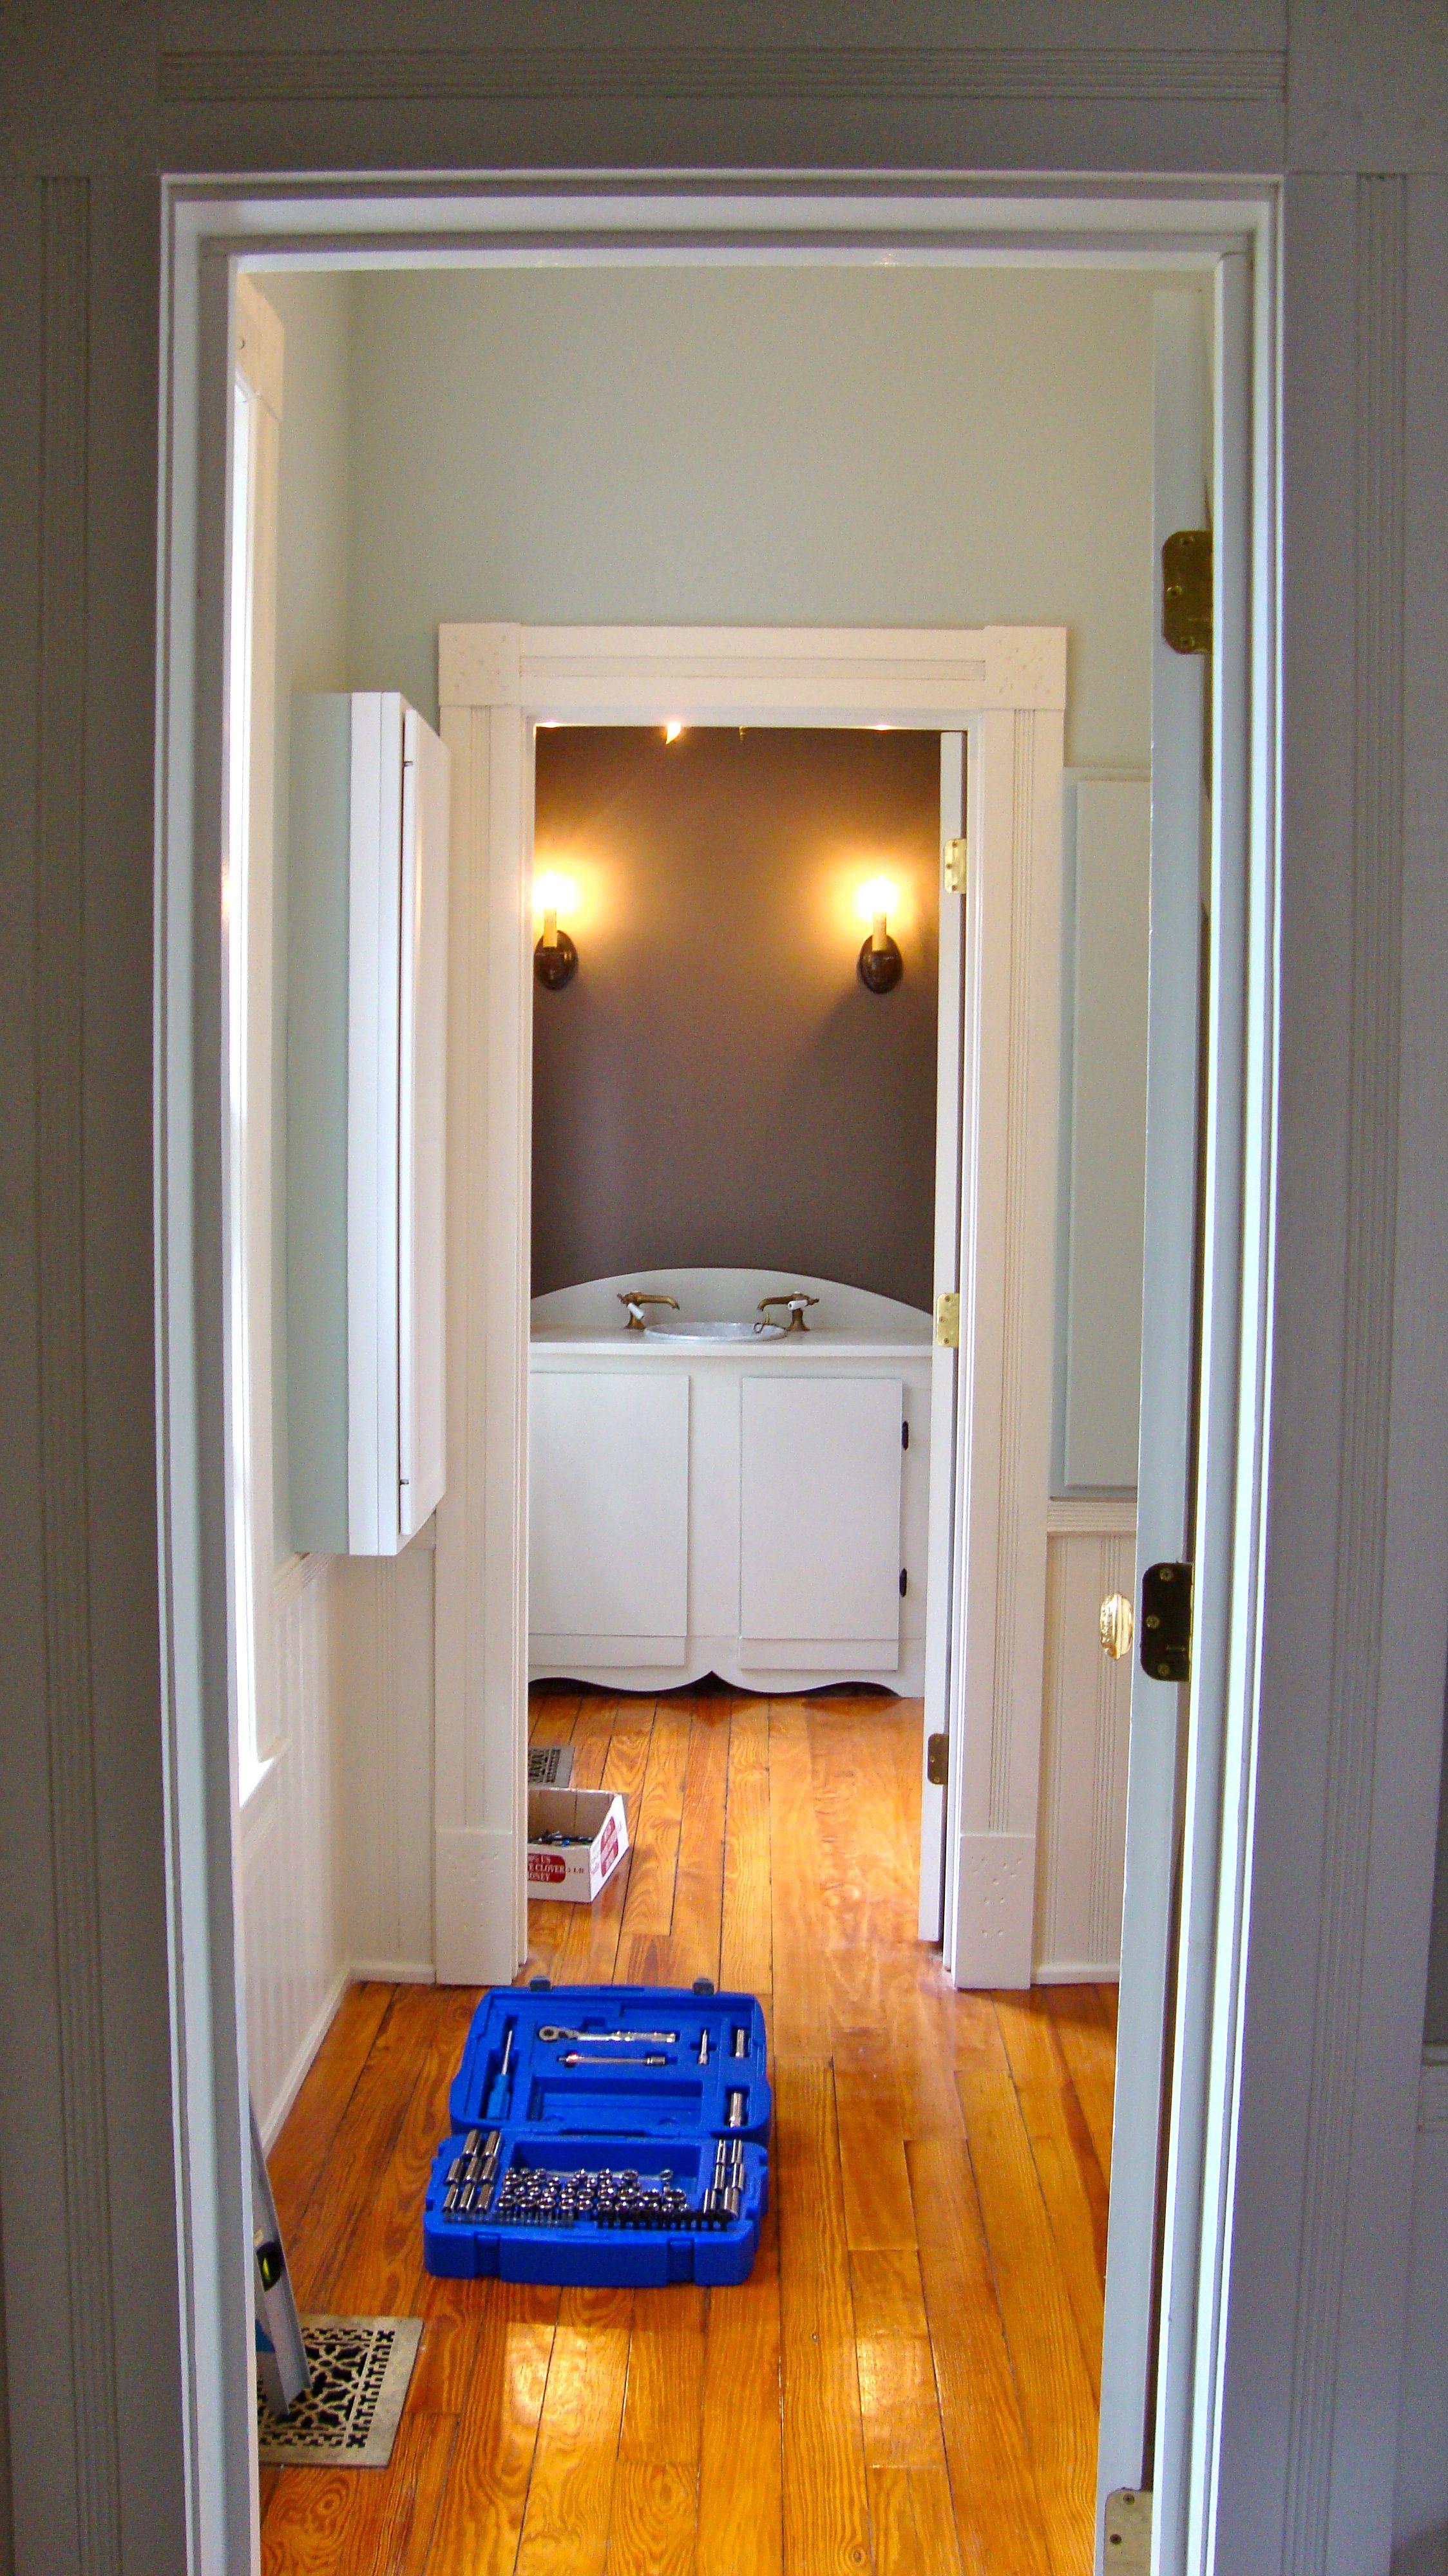 Hallway sherwin williams jogging path laundry room